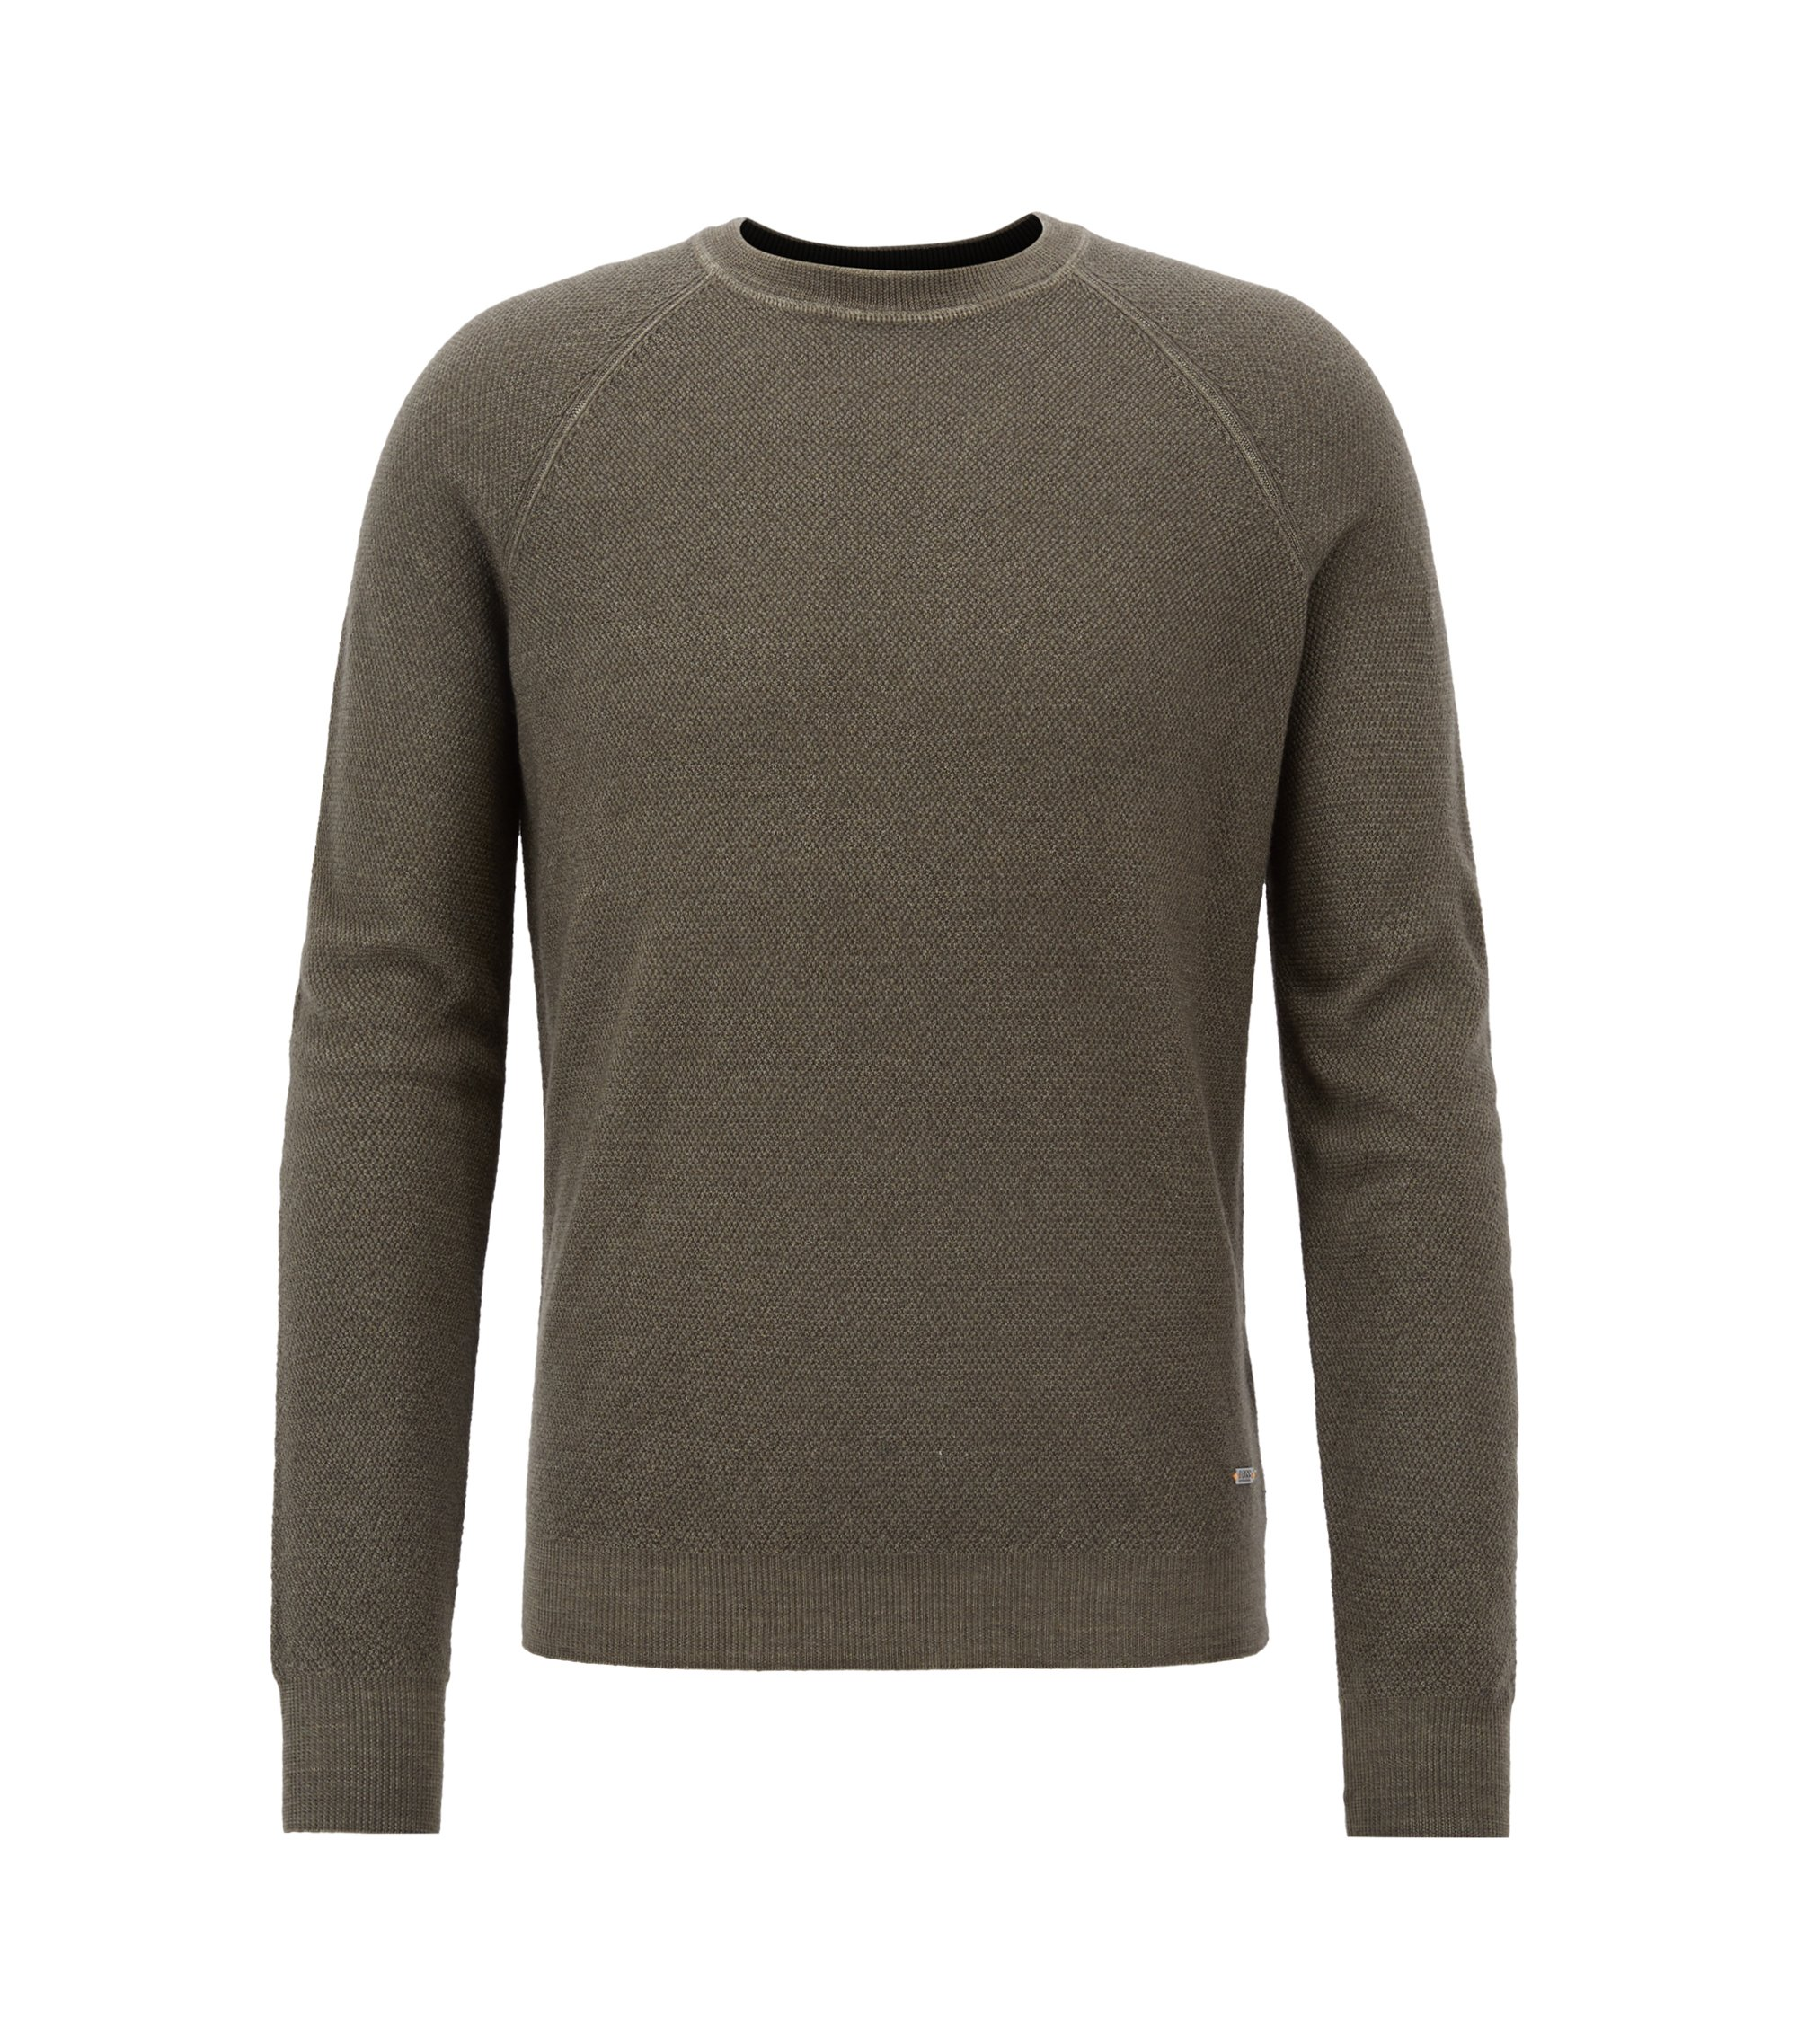 Crew-neck sweater in lightweight merino wool piqué, Dark Green